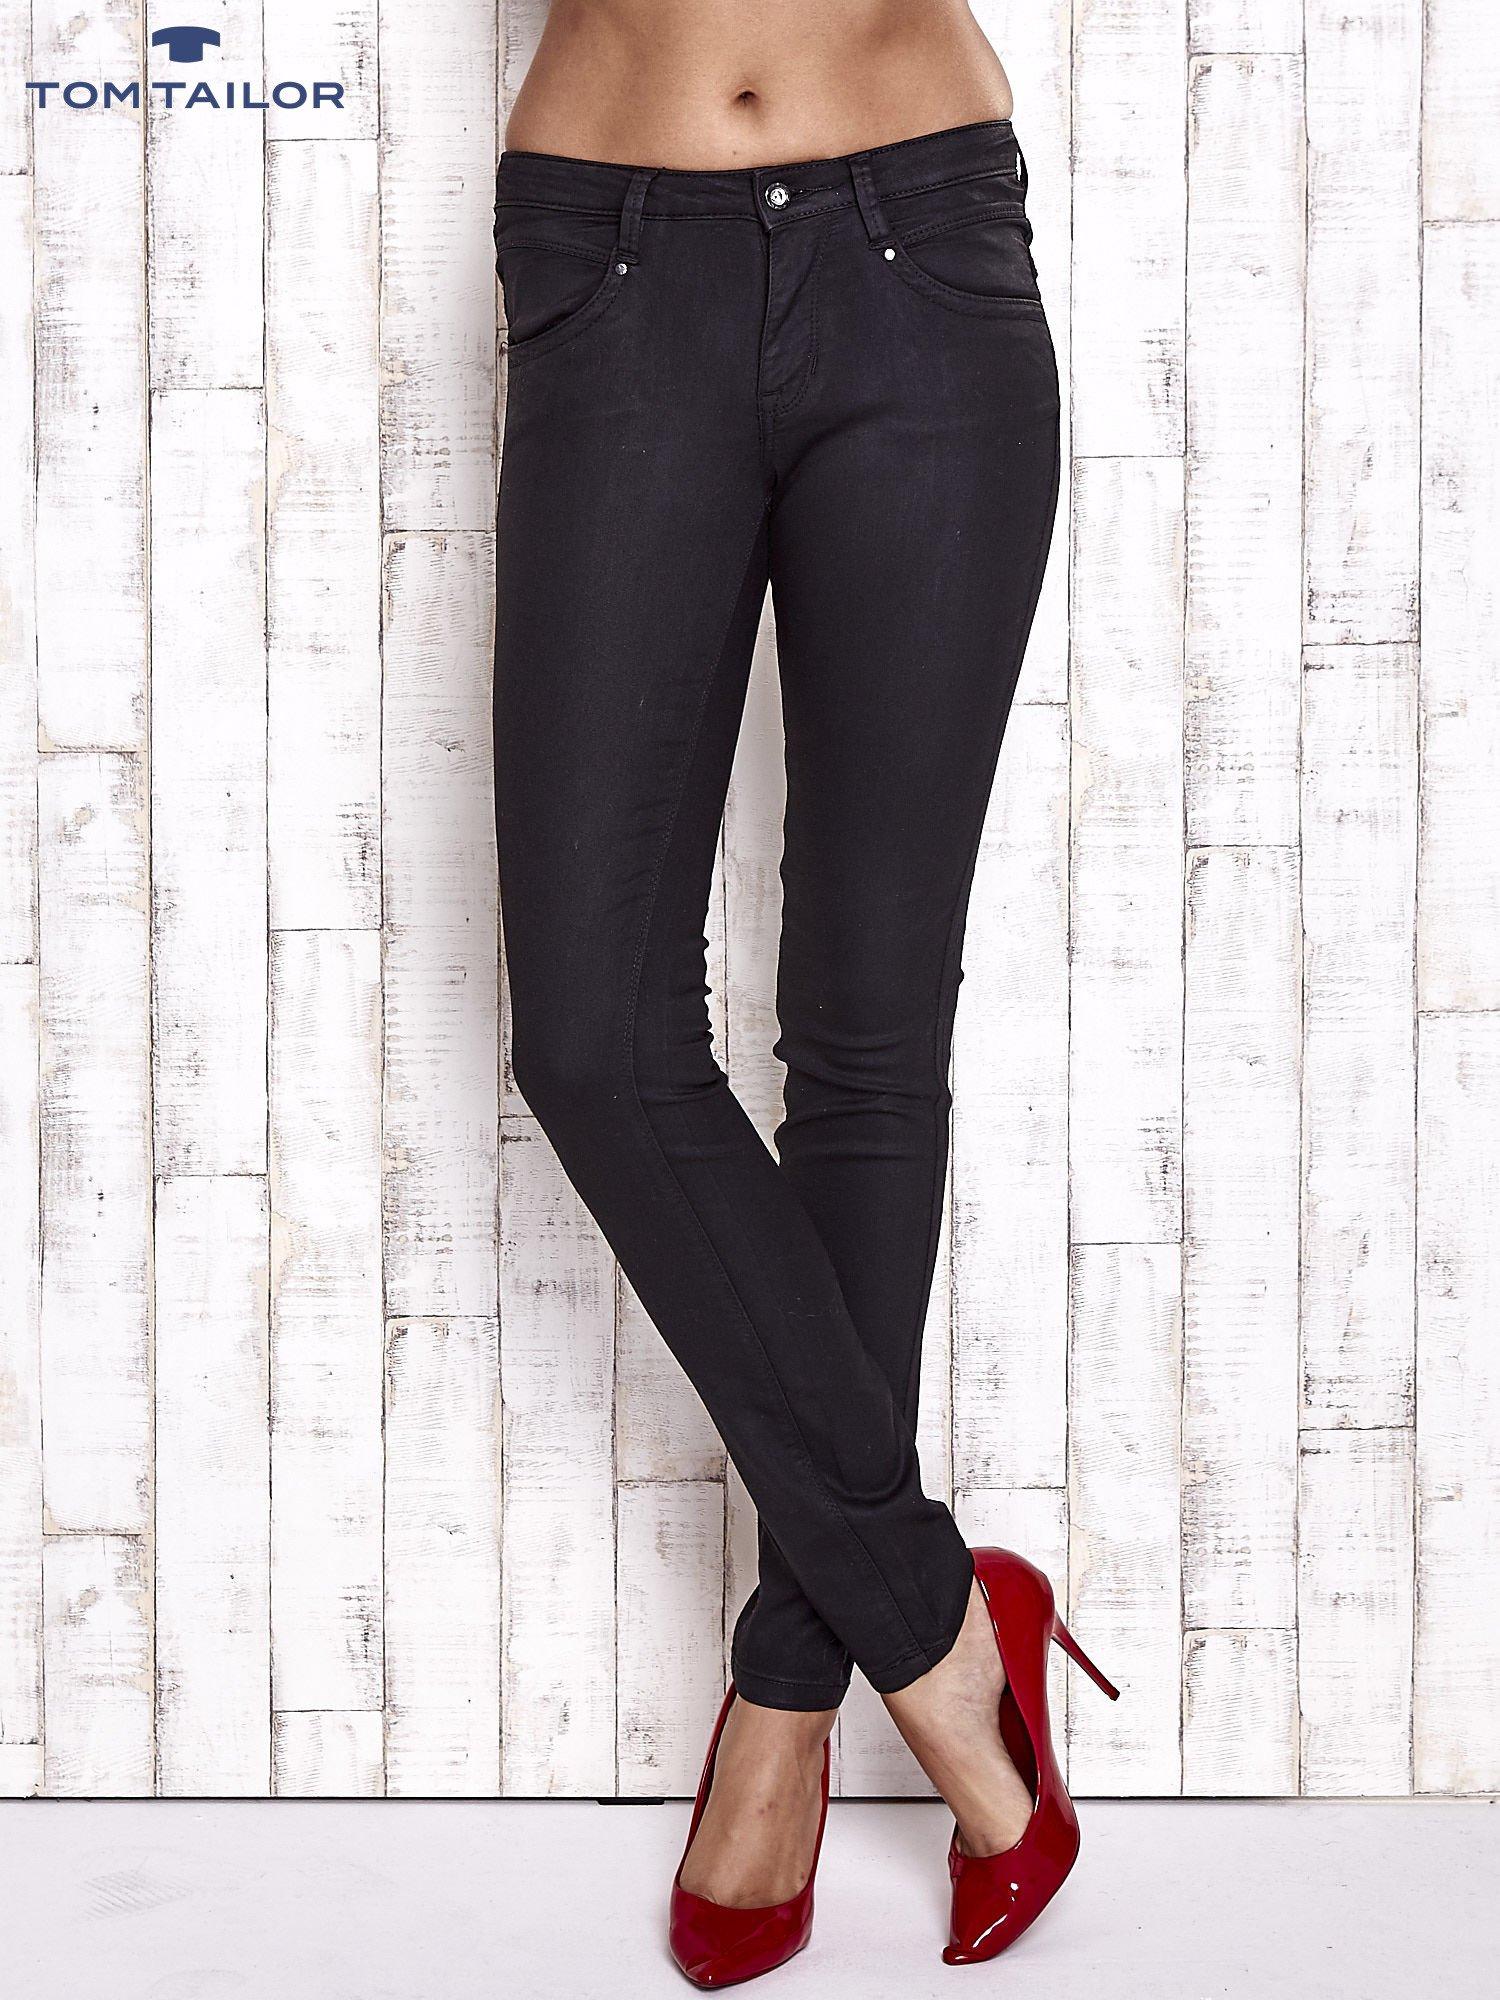 TOM TAILOR Czarne spodnie skinny jeans                                   zdj.                                  1